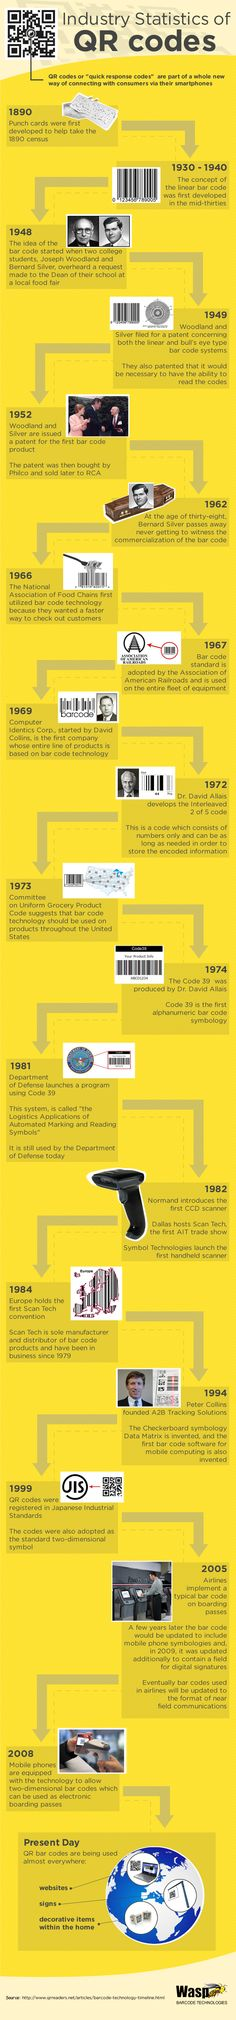 Industry Statistics of QR codes